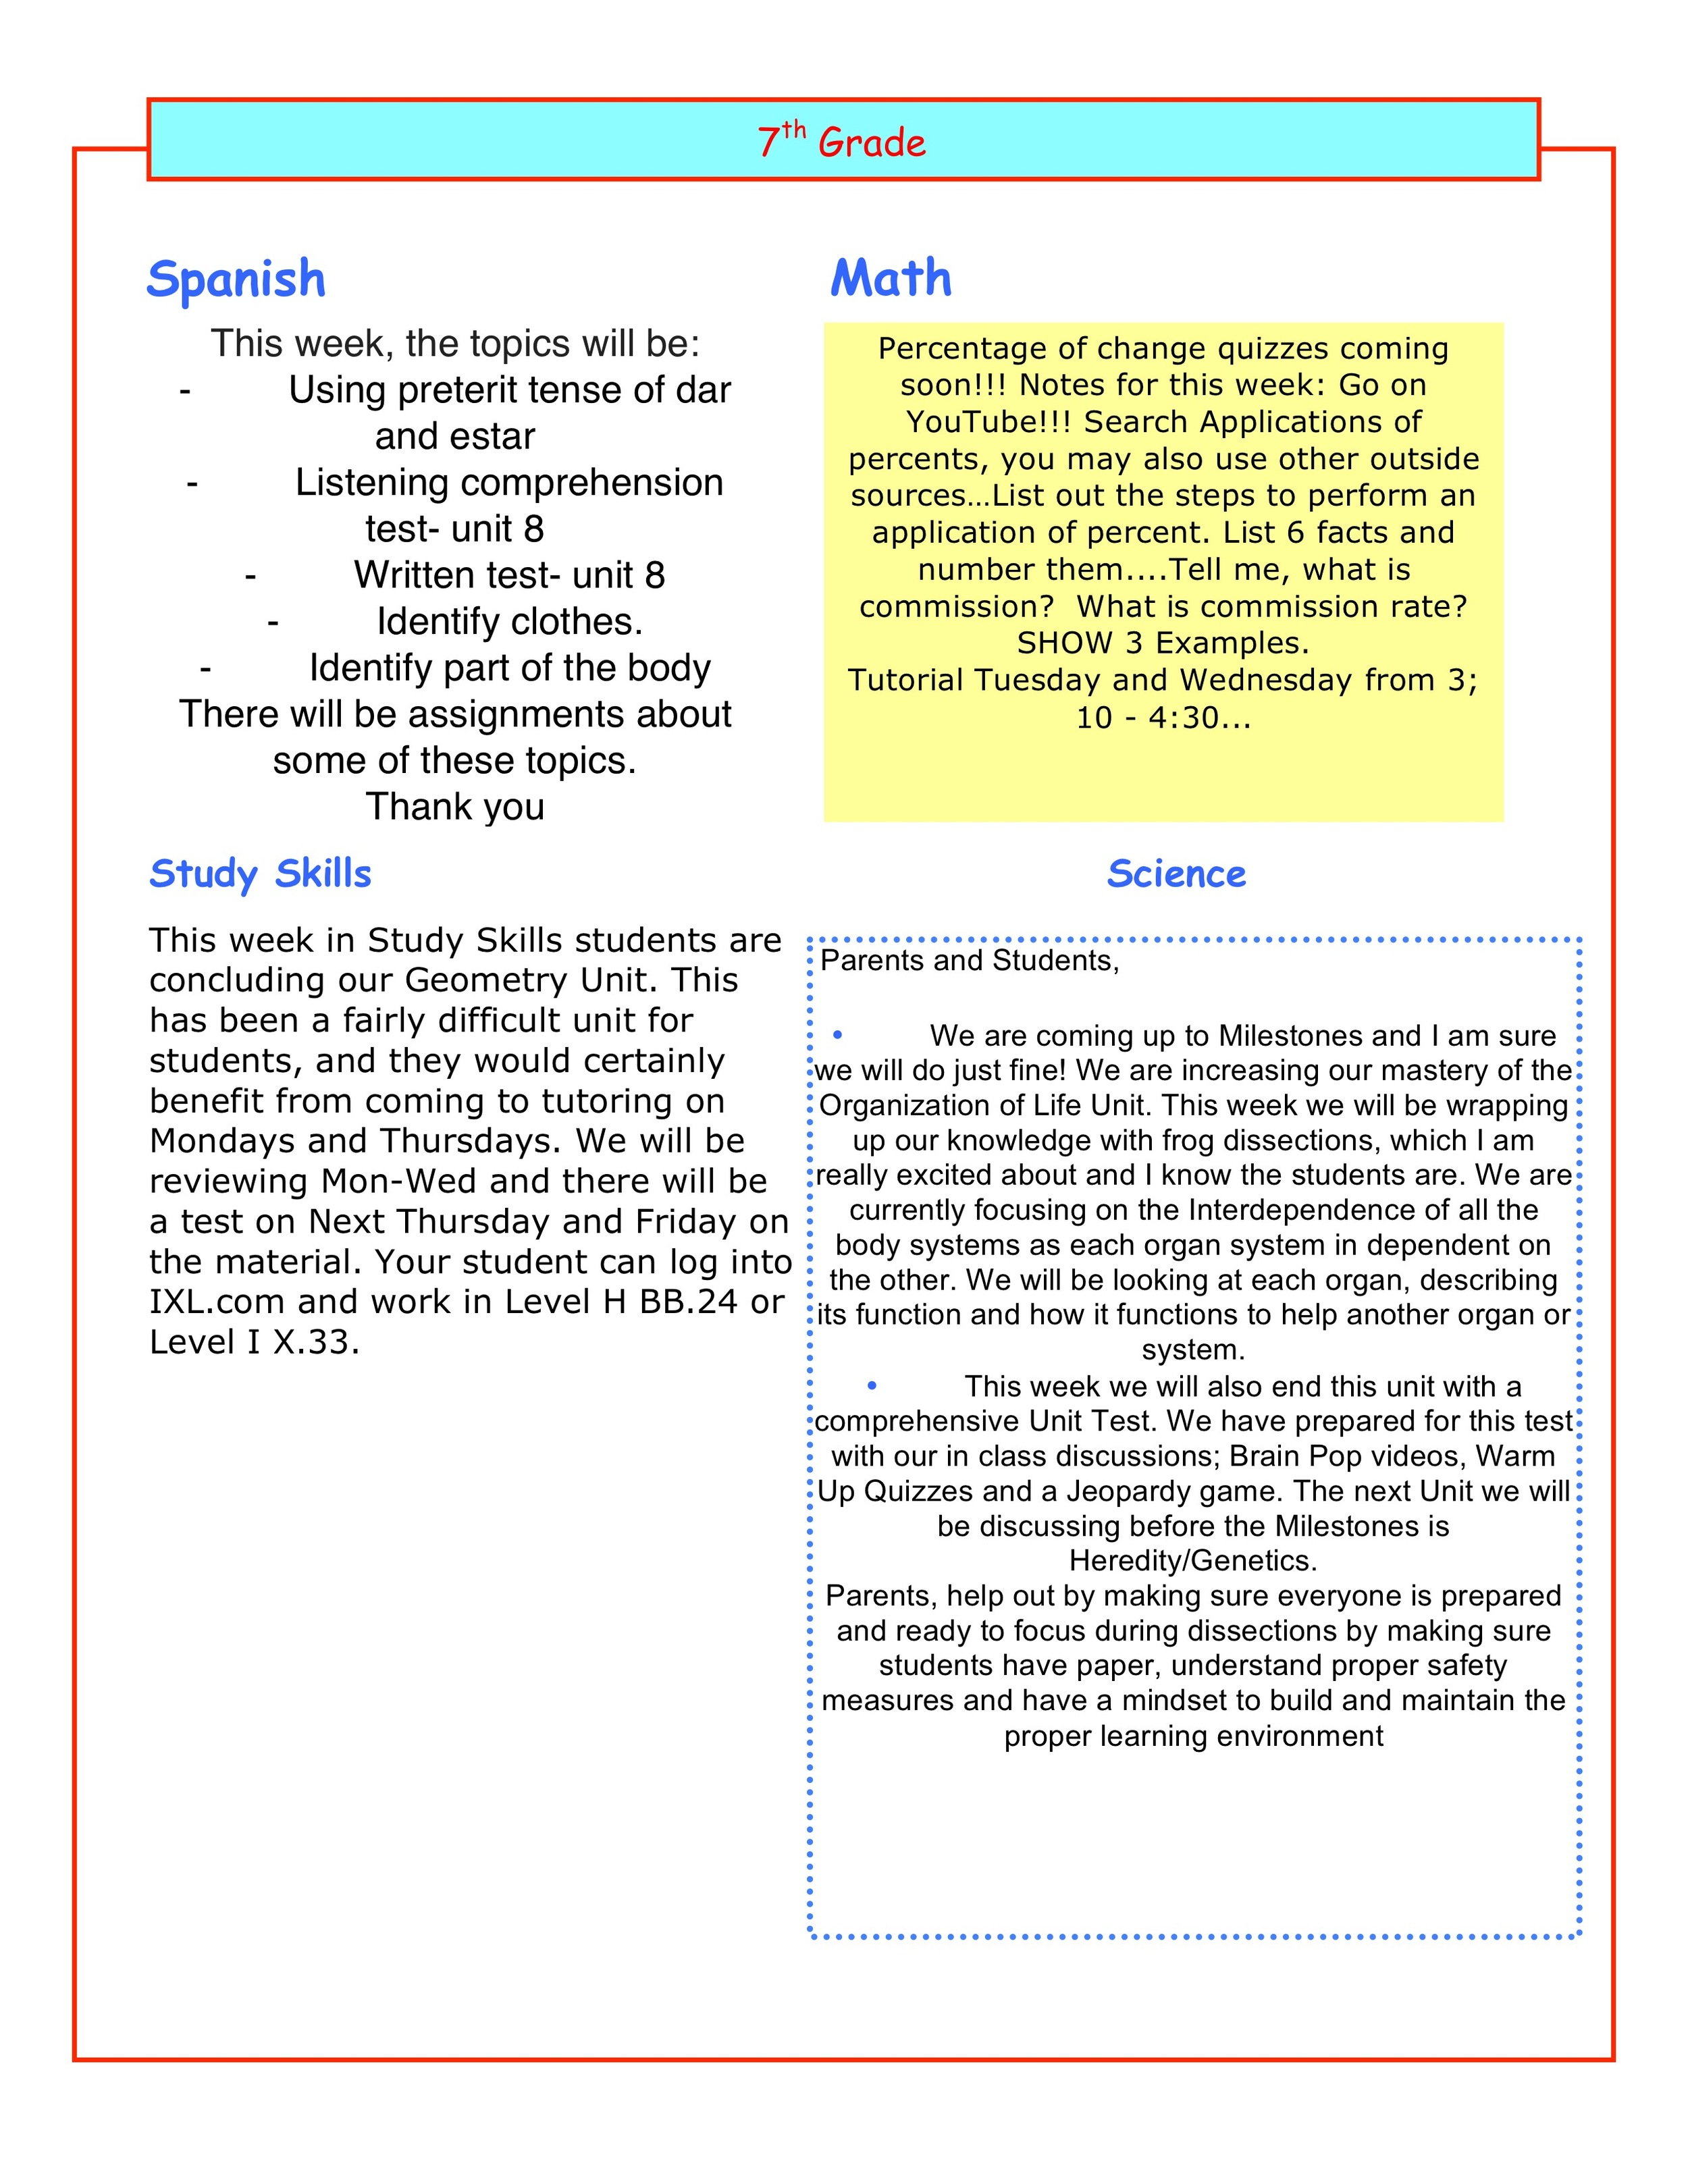 Newsletter Image7th grade 3-23-16 2.jpeg